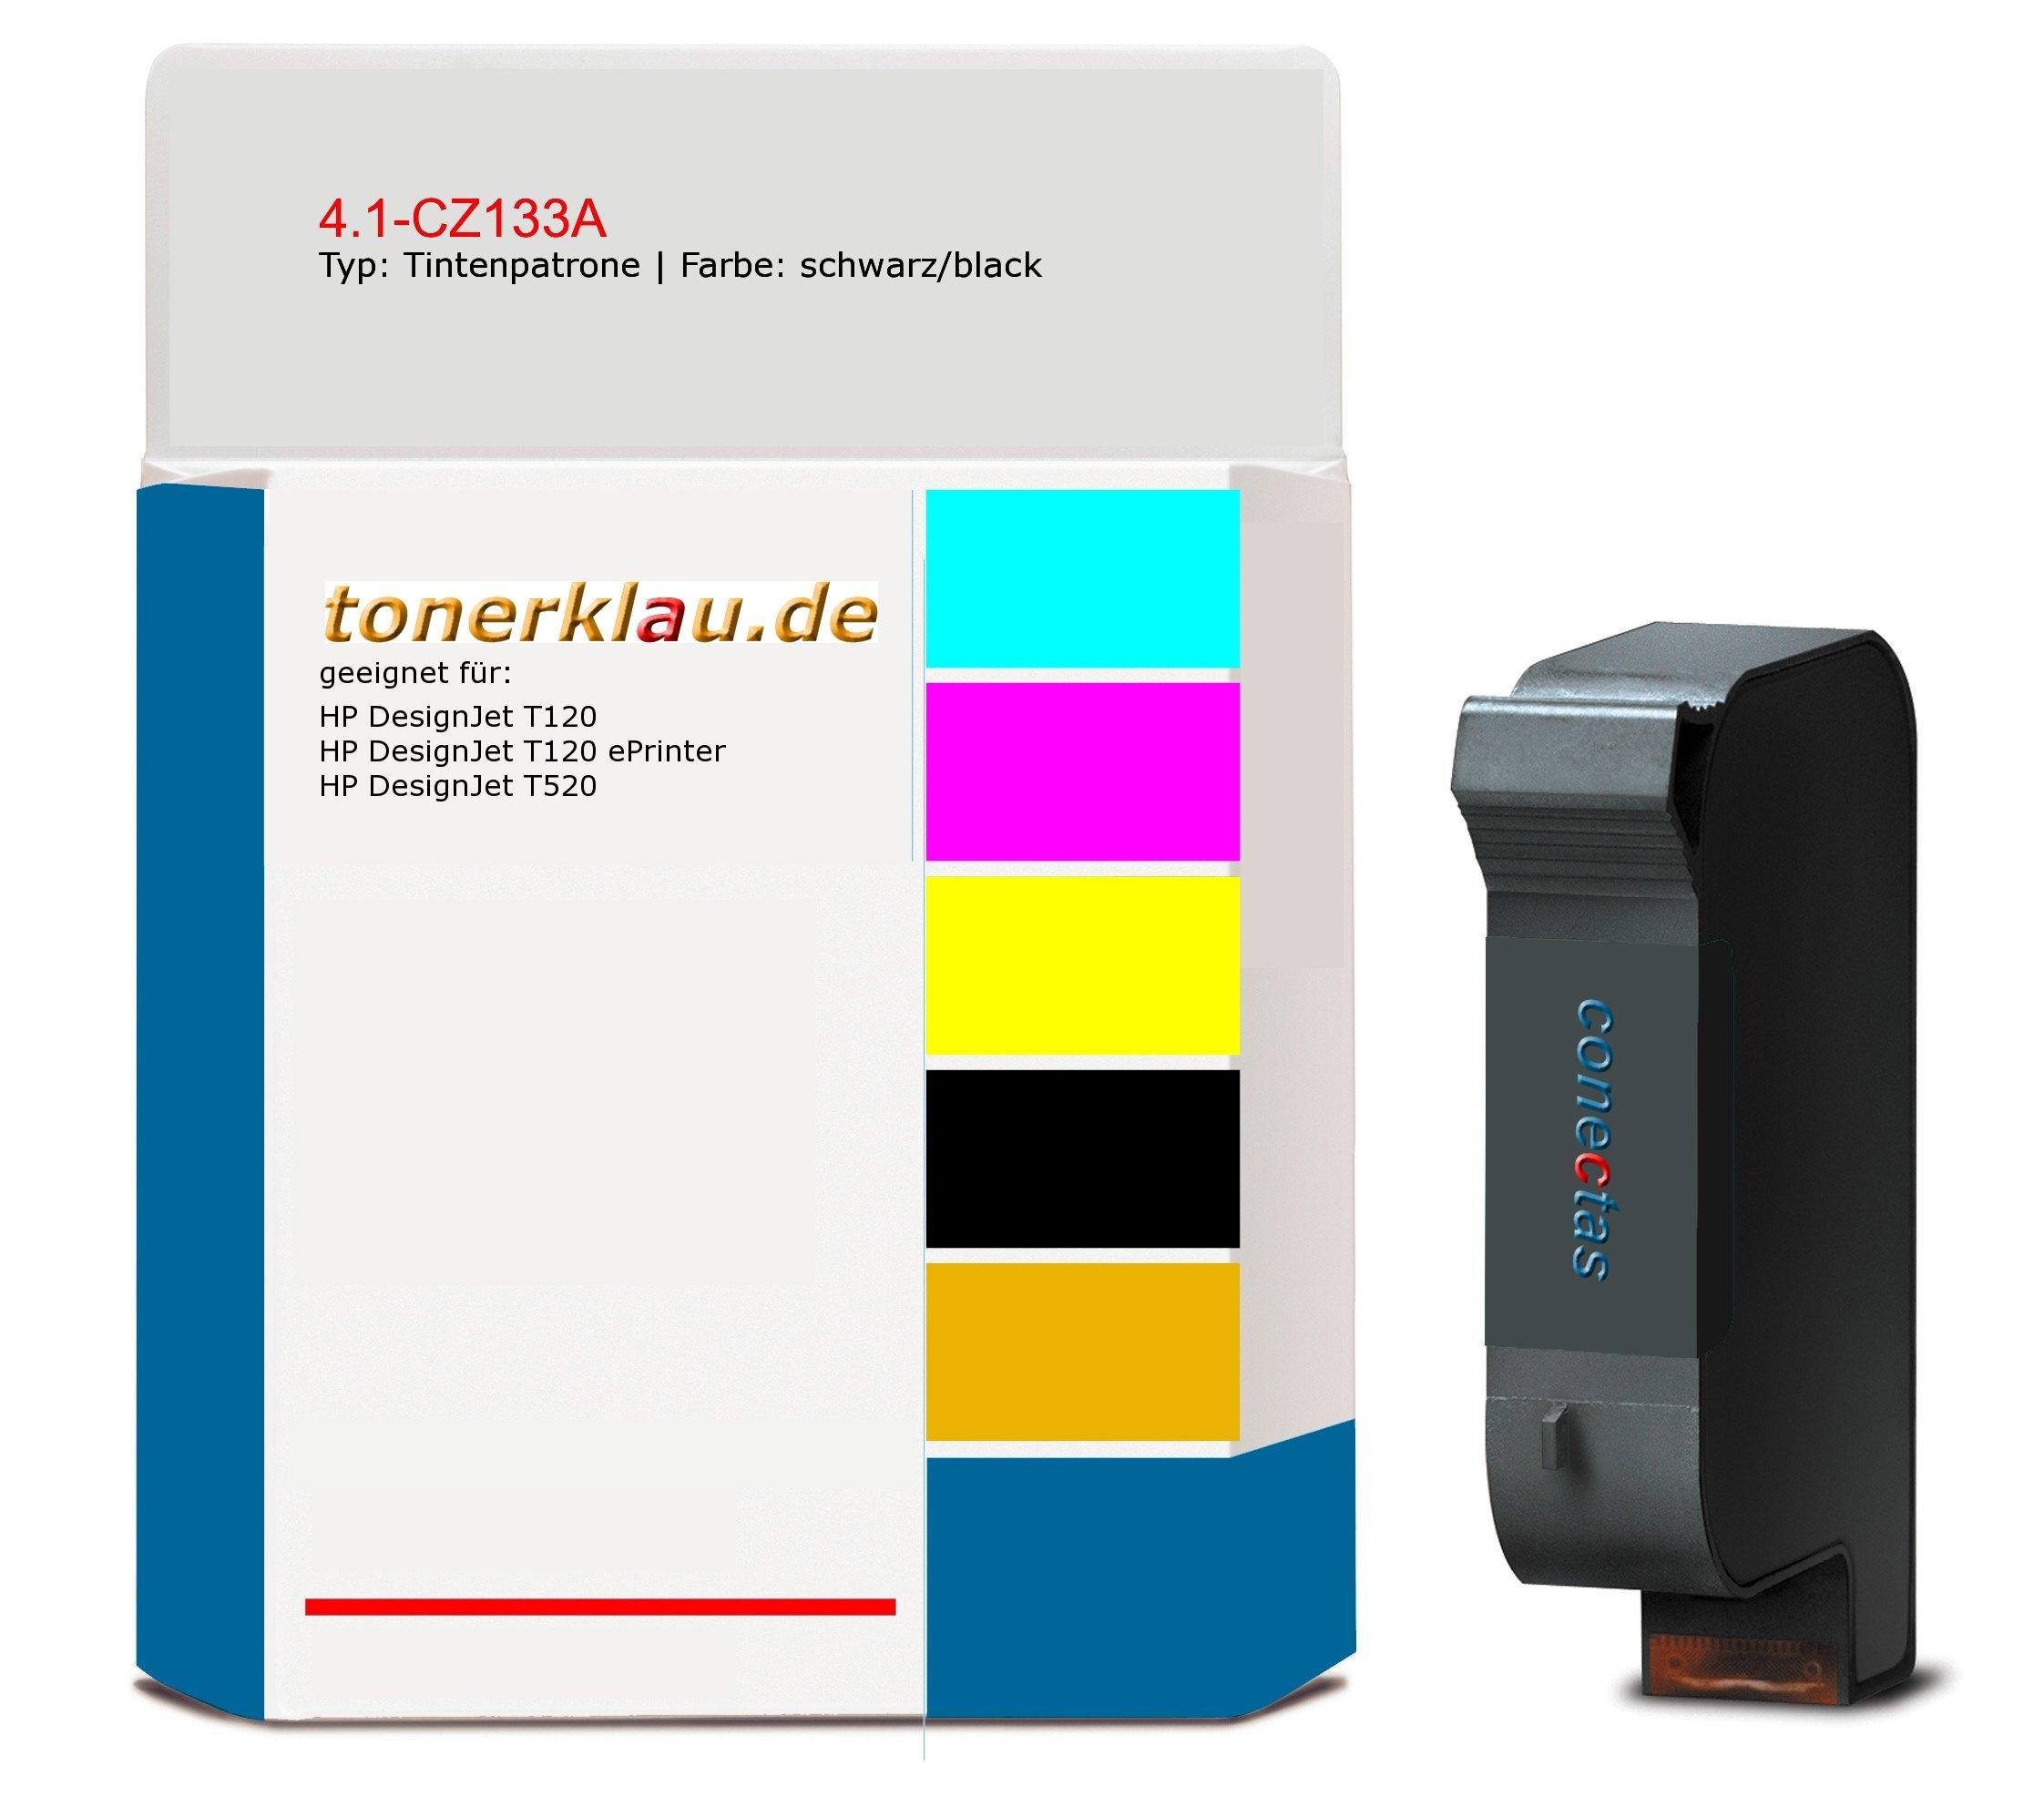 Cartucho de tinta 4.1 de CZ133 A compatible con HP CZ133 A Adecuado para: HP Designjet T120/HP Designjet T120 ePrinter/HP Designjet T520: Amazon.es: Oficina y papelería